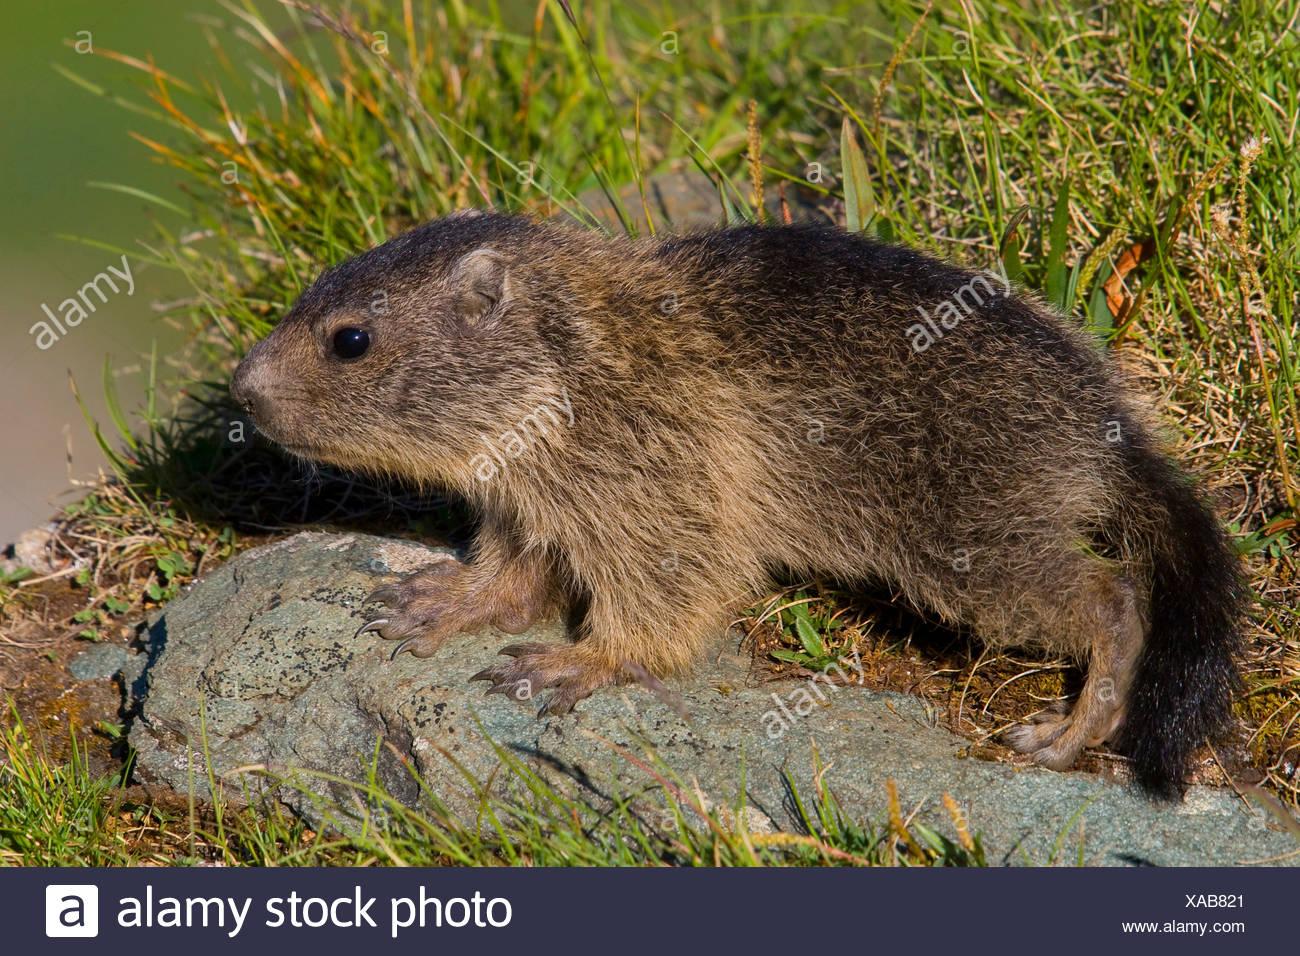 La marmota alpina (Marmota marmota), juvenil de pie sobre una piedra a la orilla del agua, Austria, Parque Nacional Hohe Tauern, Grossglockner Imagen De Stock